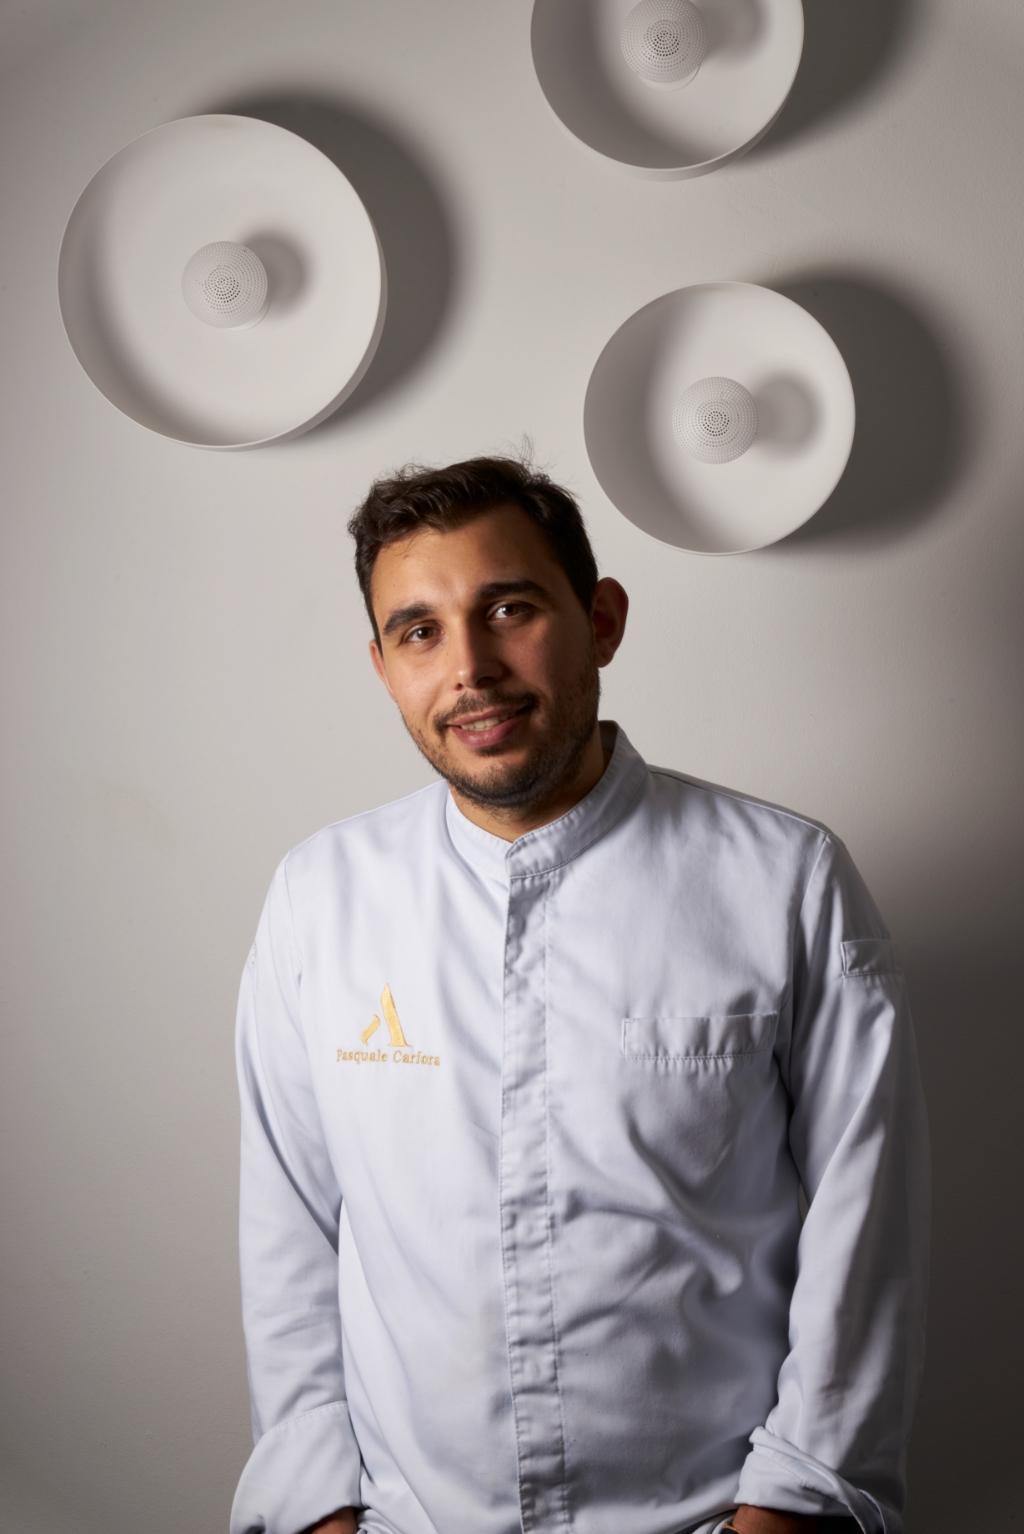 Chef Pasquale Carfora Giovanni L'Apice © BDU Media